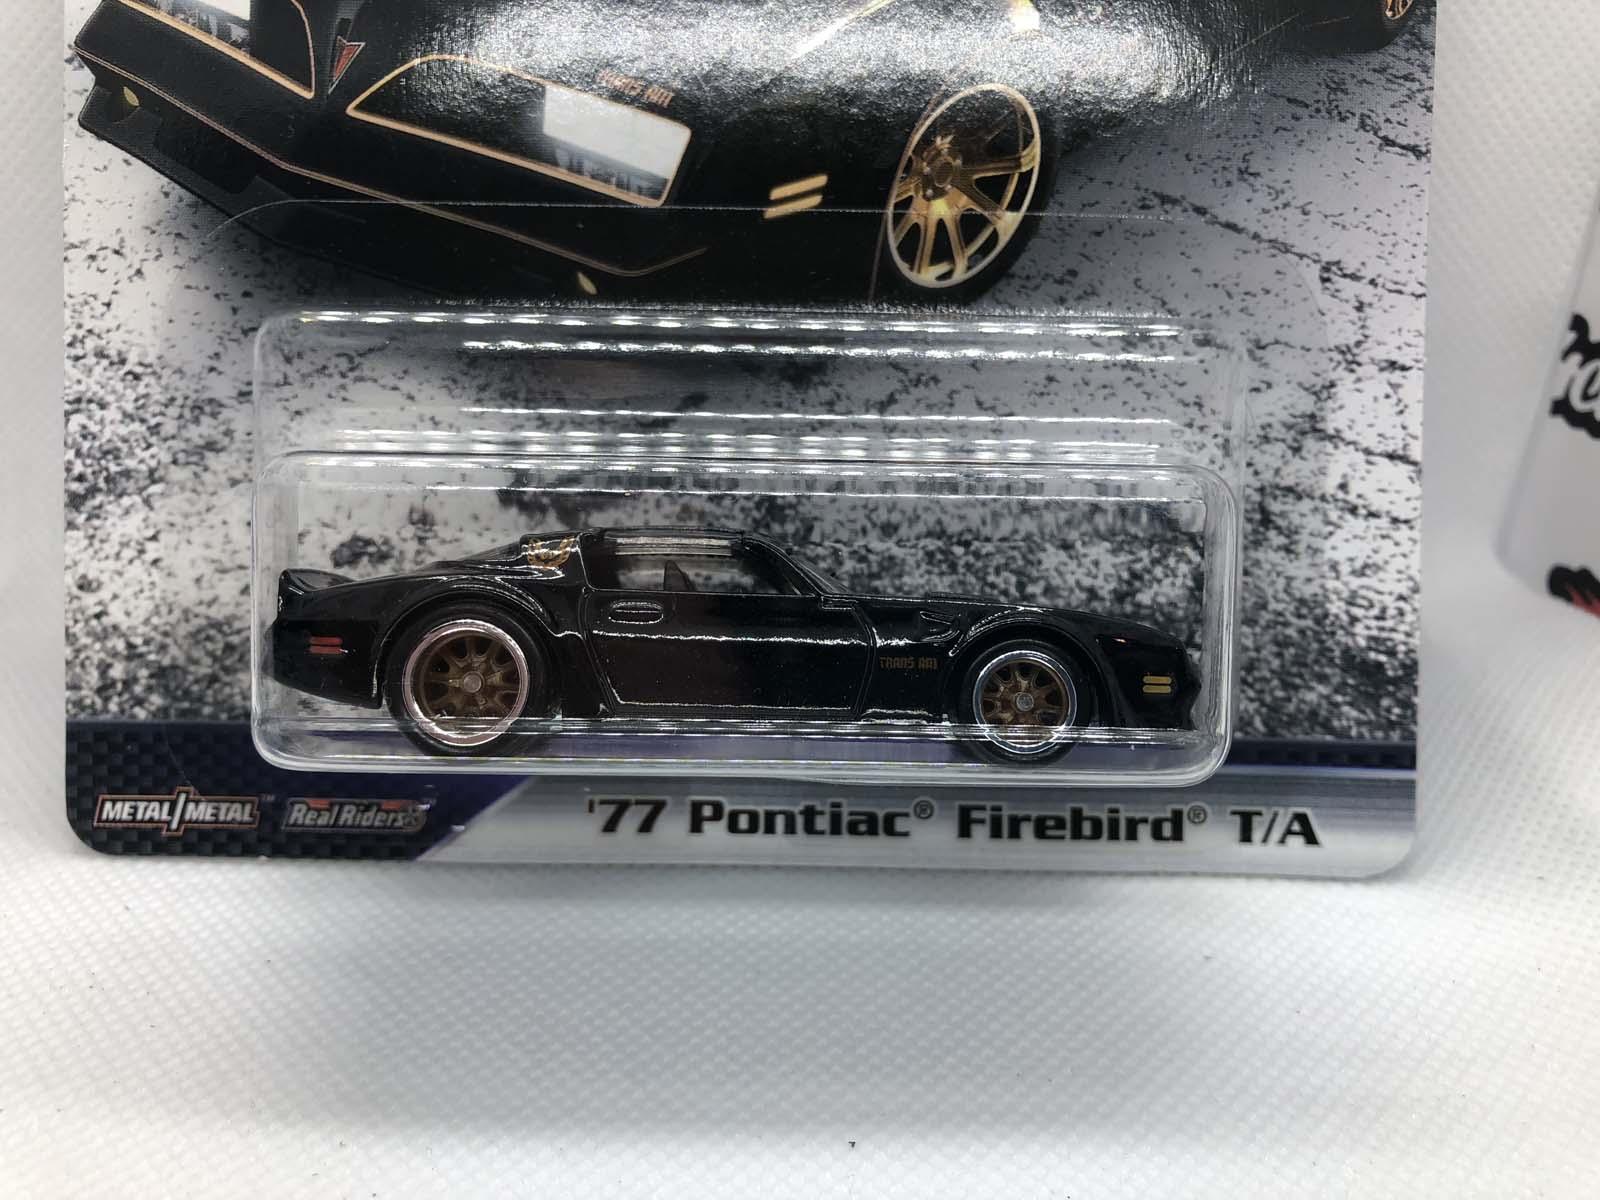 77 Pontaic Firebird T/A